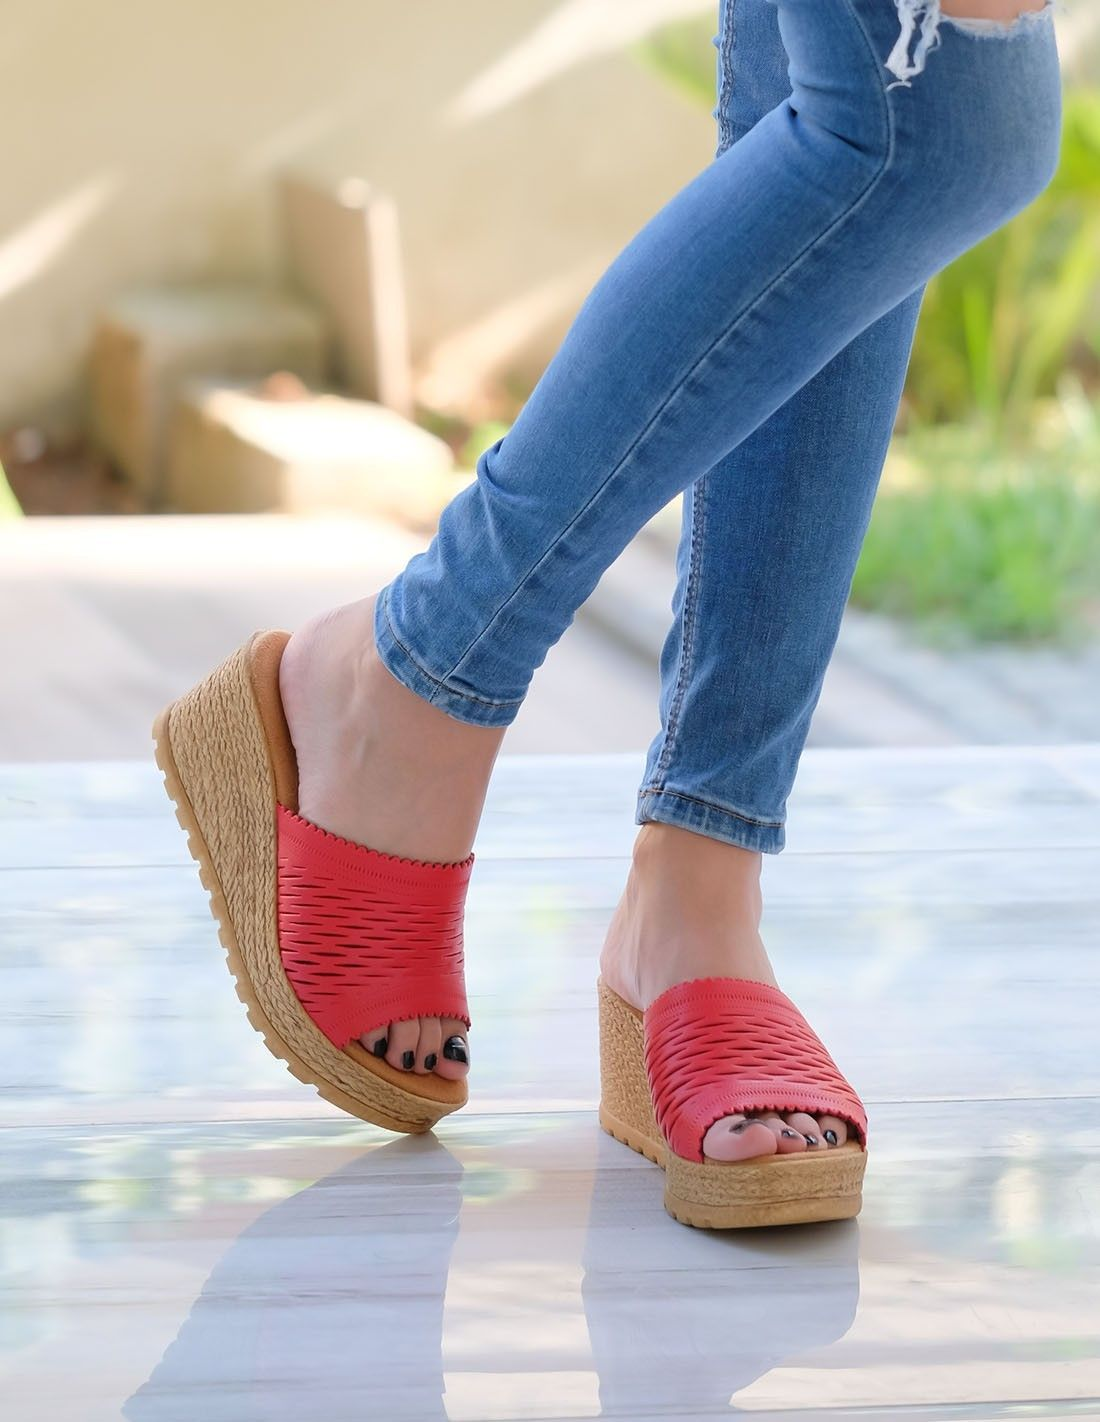 Bona Kirmizi Cilt Dolgu Topuk Terlik Slippers Fashion Moda Dolgu Topuk Stiletto Sandalet